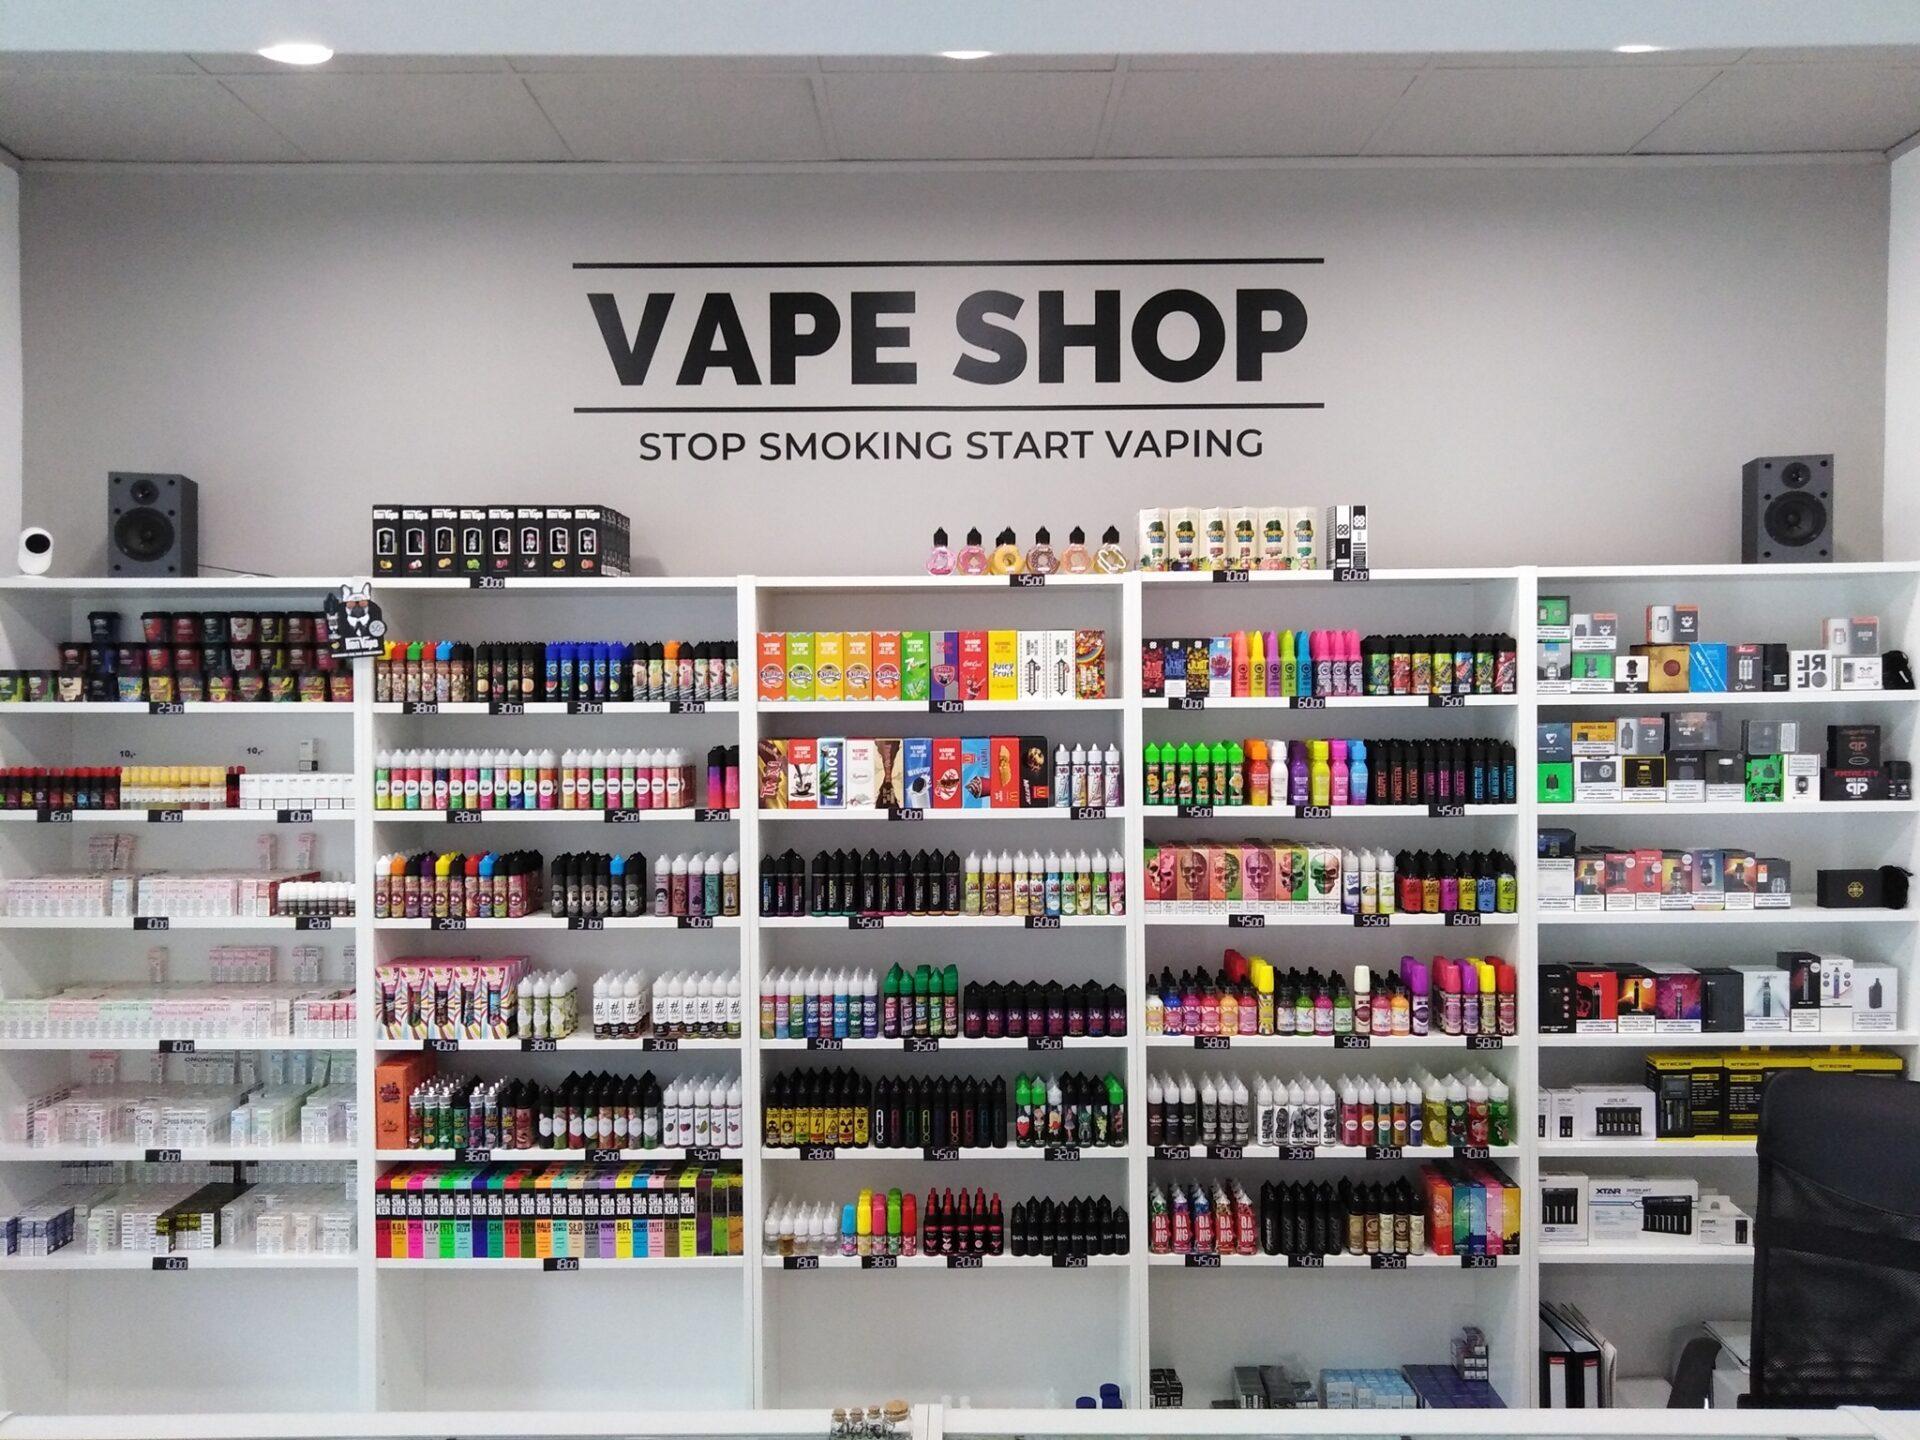 Best online vape store in 2020 - Top 10 vape shop list